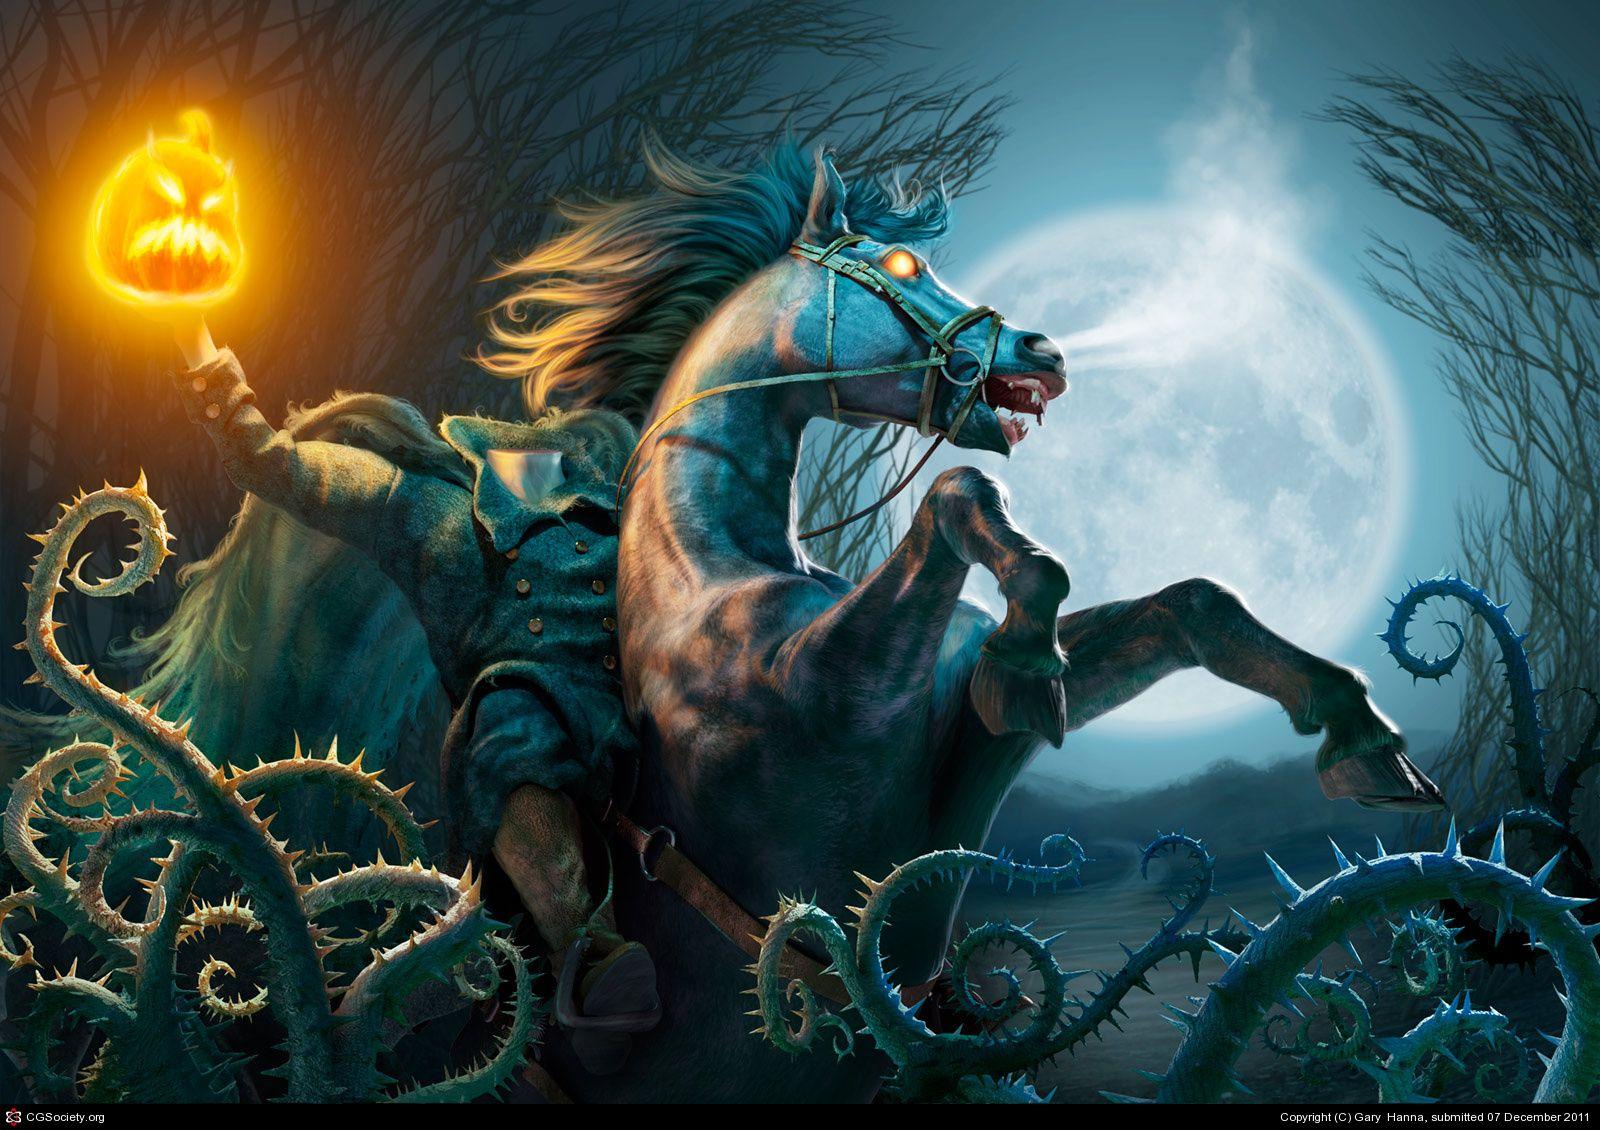 Headless Horseman Wallpaper Wallpapersafari Wallpapersafari Com The Headless Horseman By Gary Hanna 3d Cgs Headless Horseman Horseman Character Design